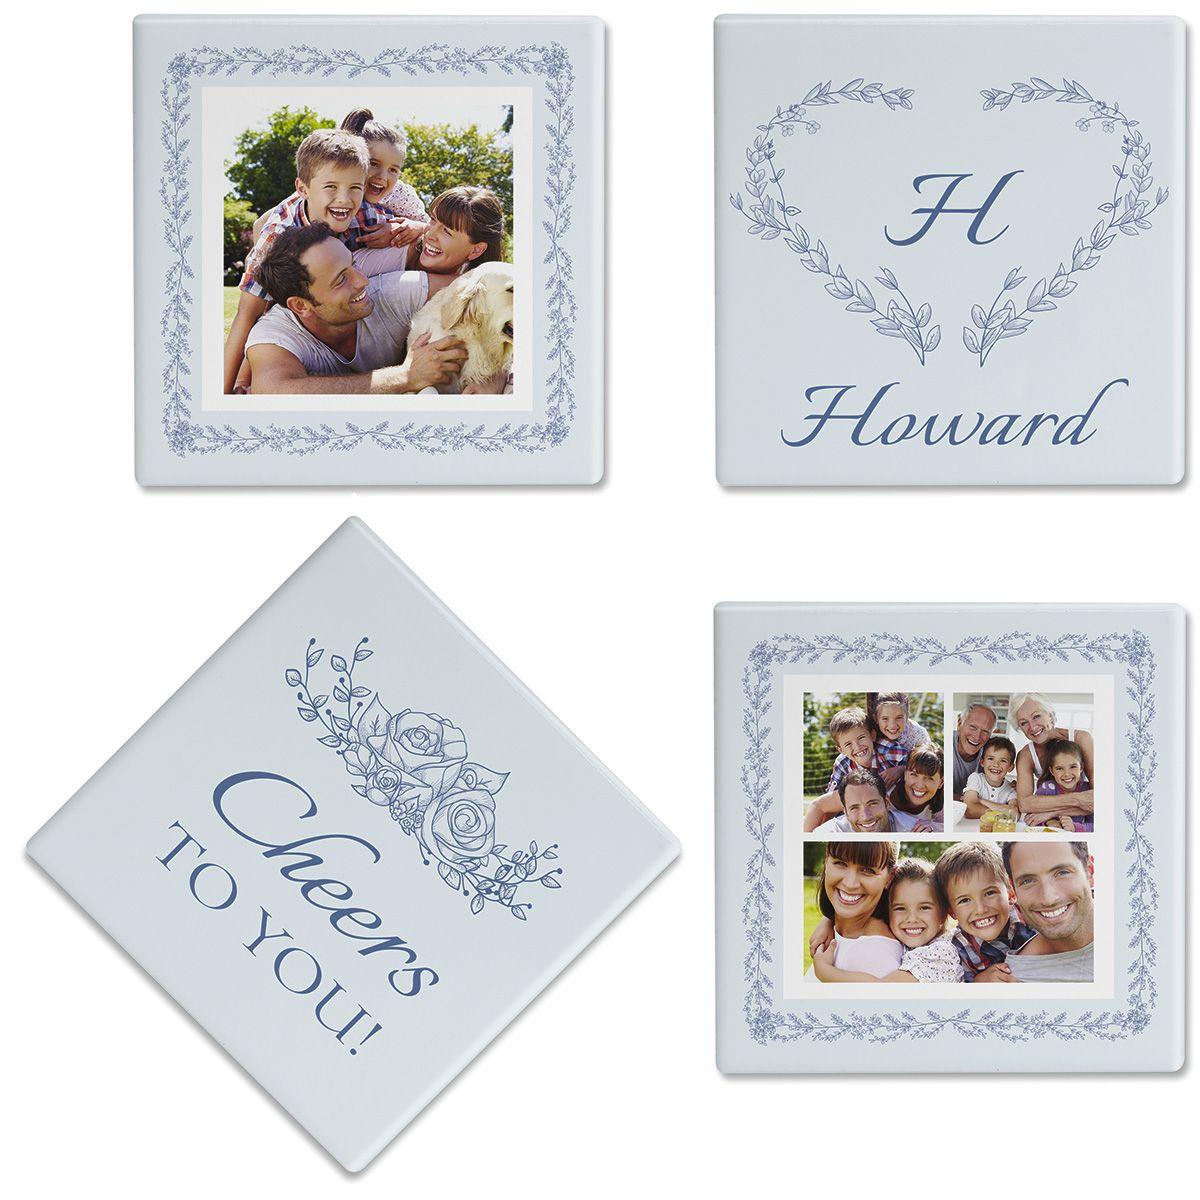 Laurel Cheers Custom Photo Coasters